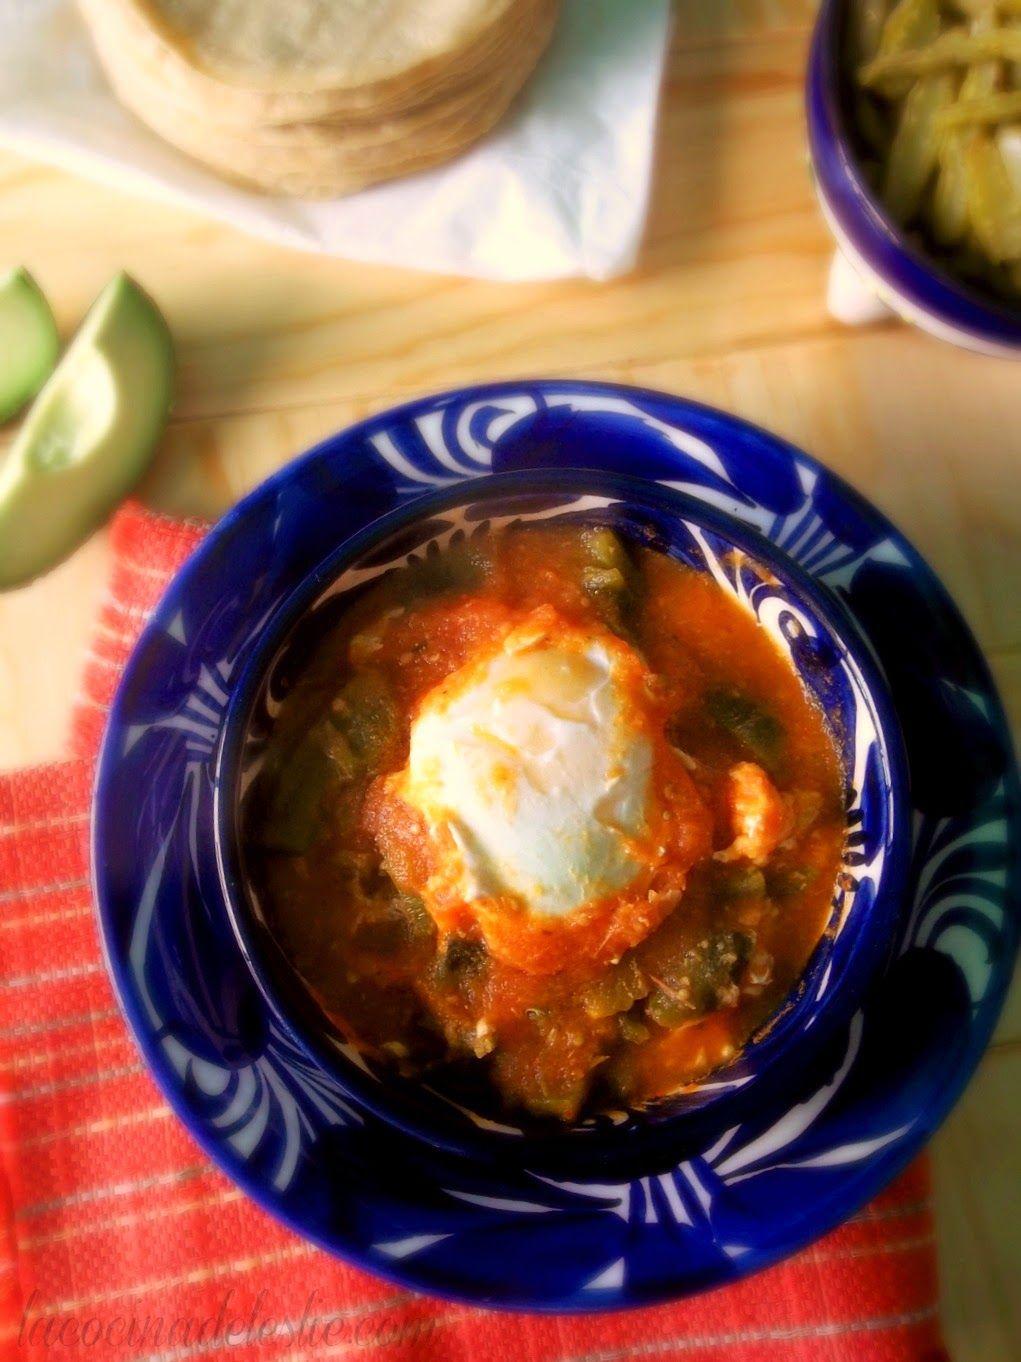 Huevos ahogados recetas a la mexicana pinterest - Cuisine mexicaine traditionnelle ...